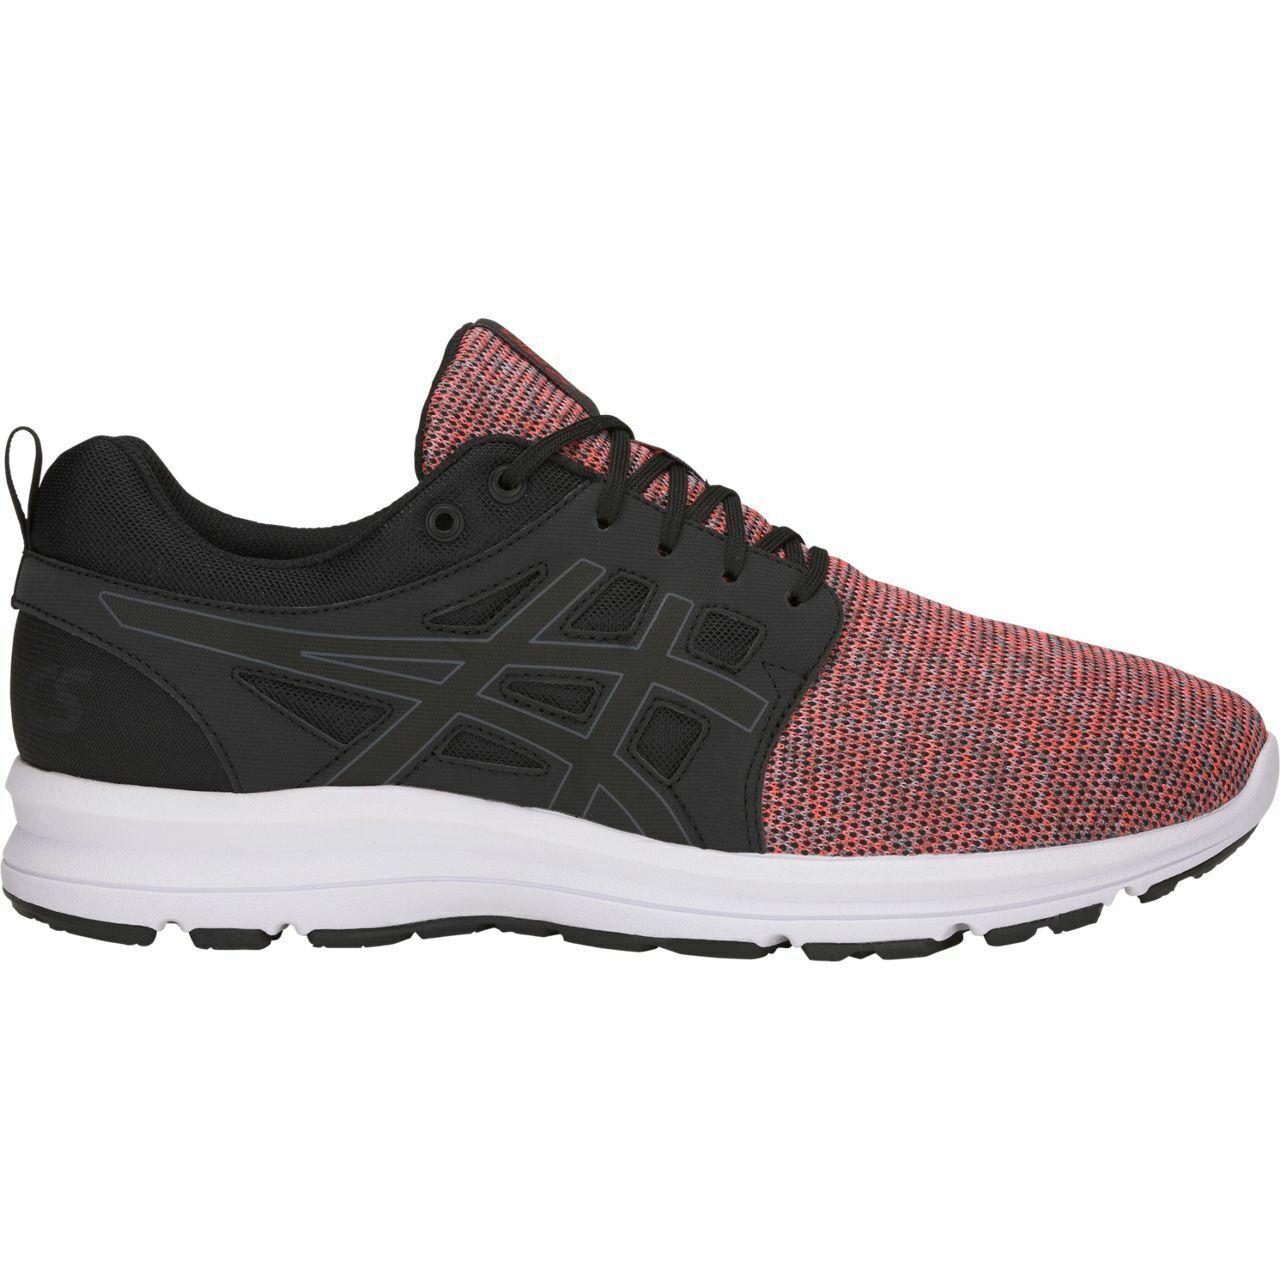 Asics 1021A047-600 GEL-TORRANCE REDSNAPPER BLACK Men's Running shoes